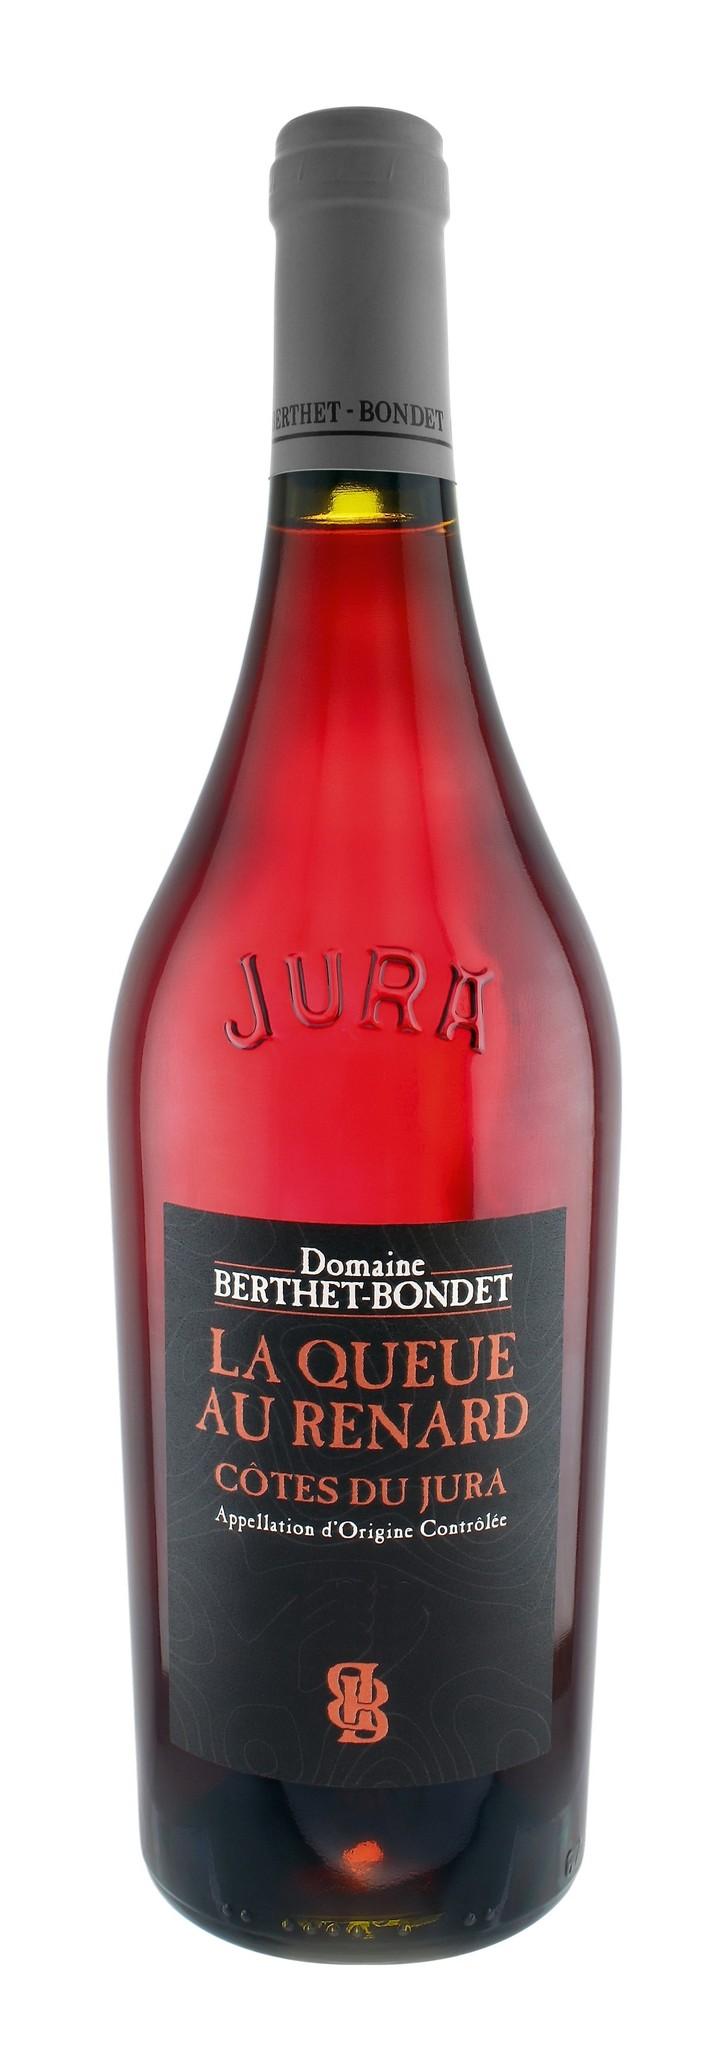 Berthet-Bondet - Jura 2018 Côtes du Jura La Queue au Renard, Domaine Berthet-Bondet